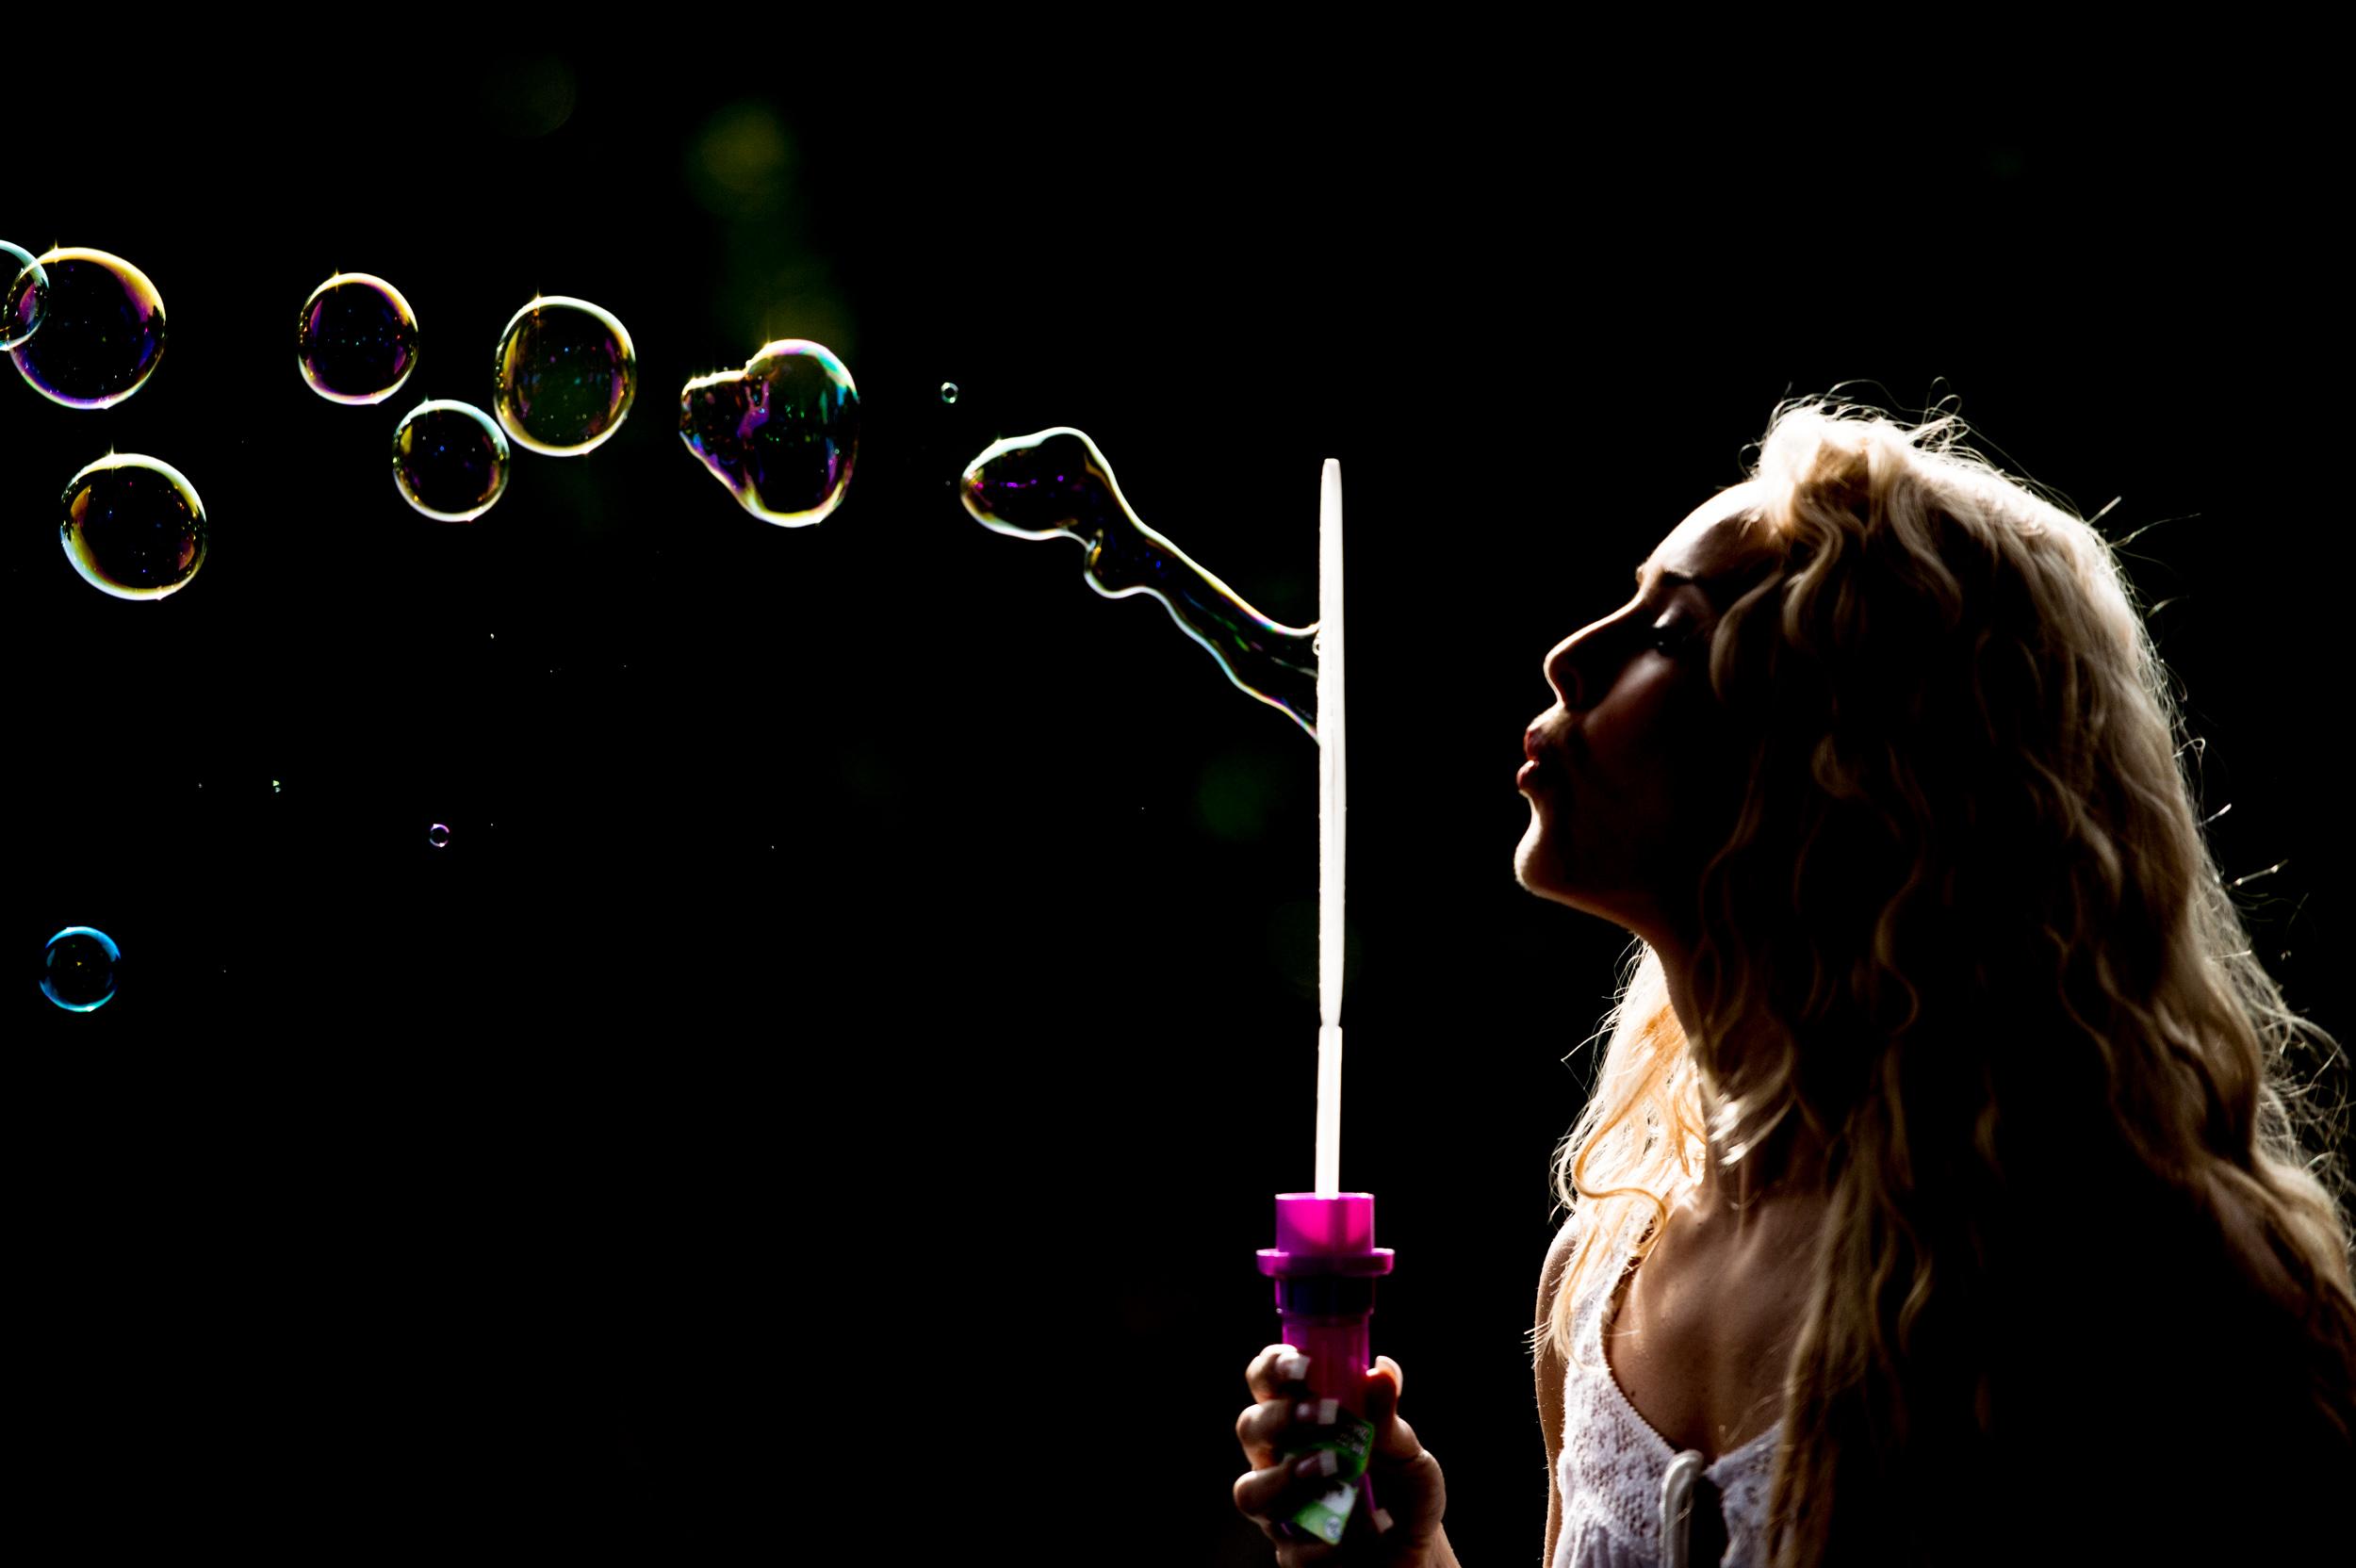 lighting photography courses sydney-1.jpg